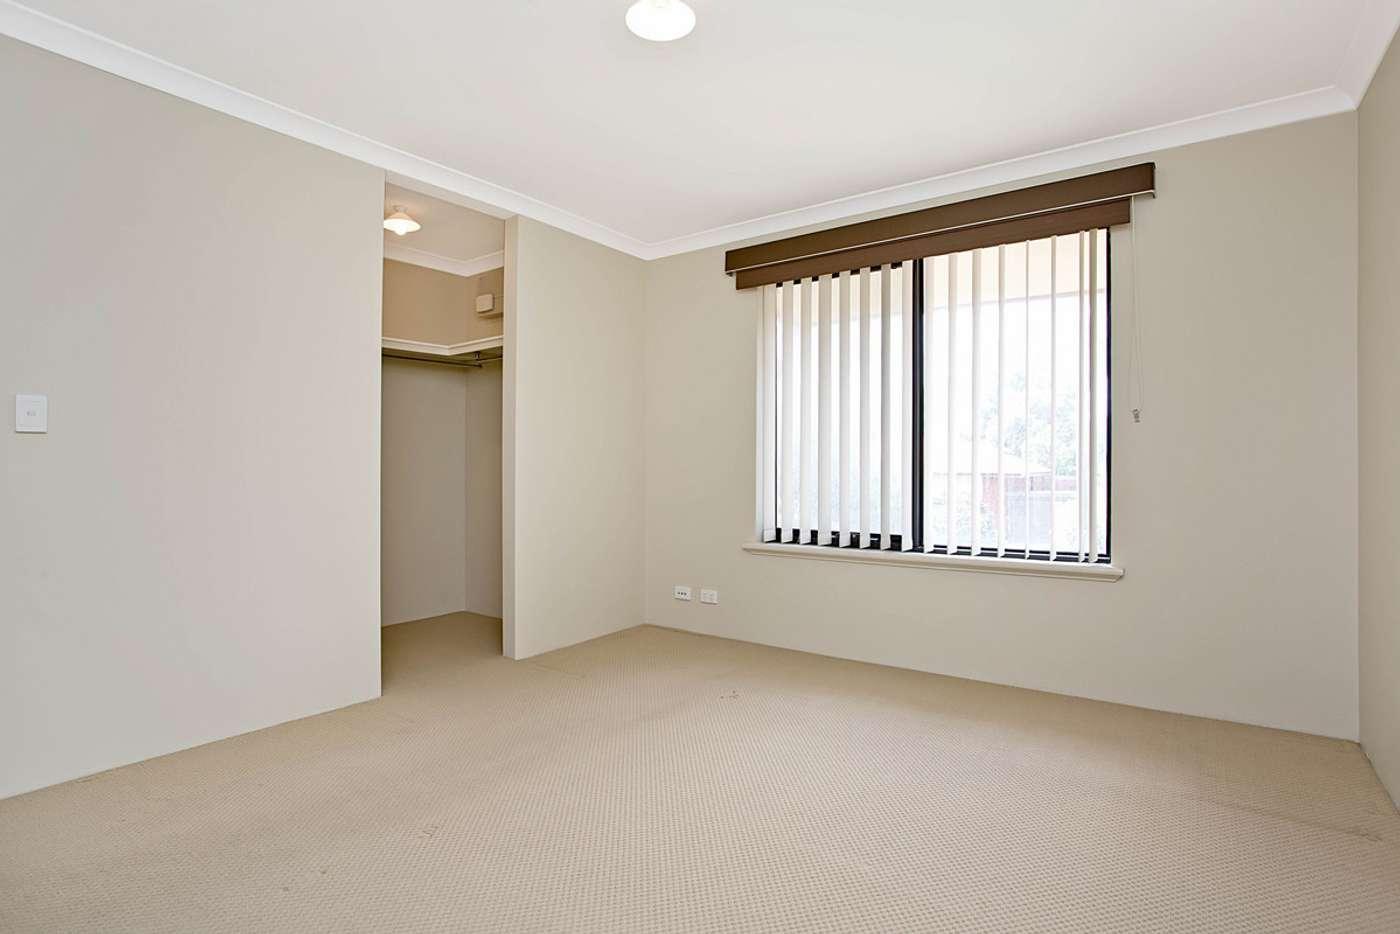 Sixth view of Homely house listing, 9 Elizabeth Street, Kewdale WA 6105